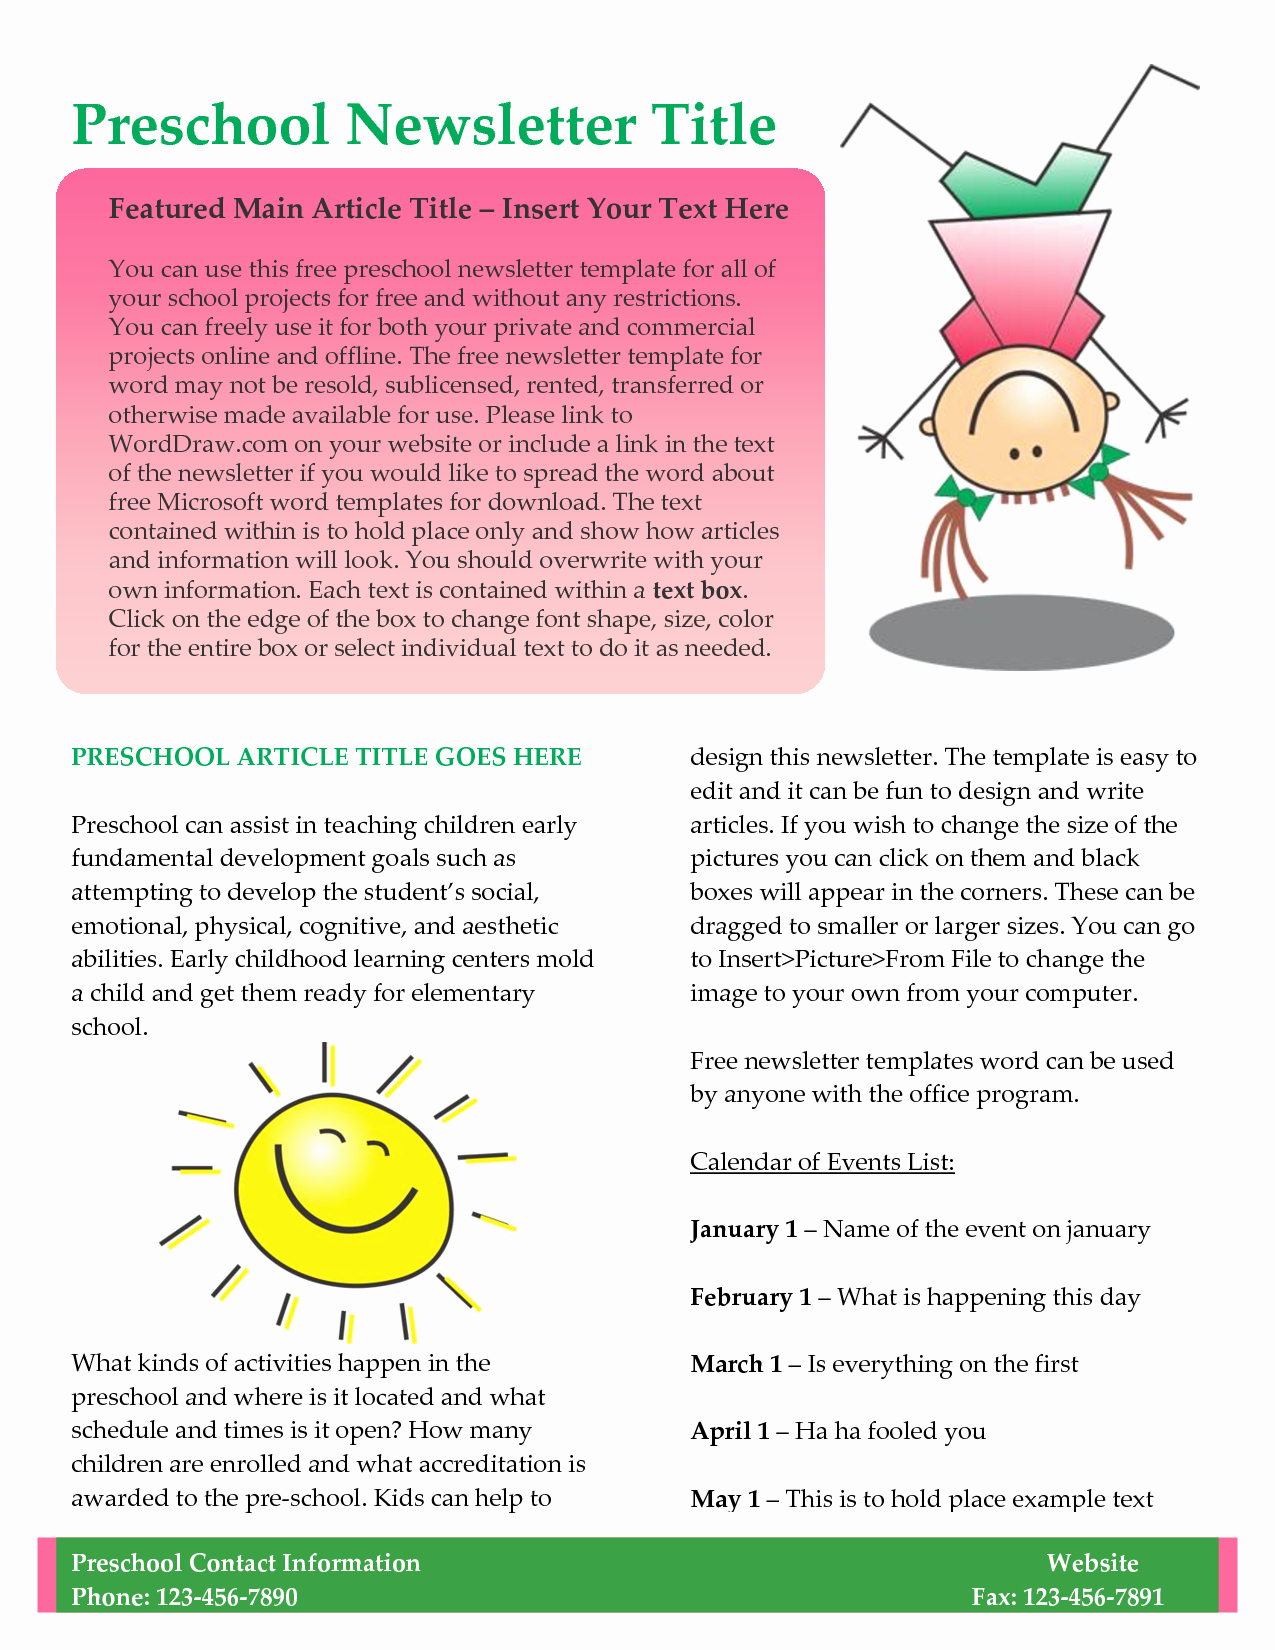 Free Print Newsletter Templates New Preschool Newsletter Template